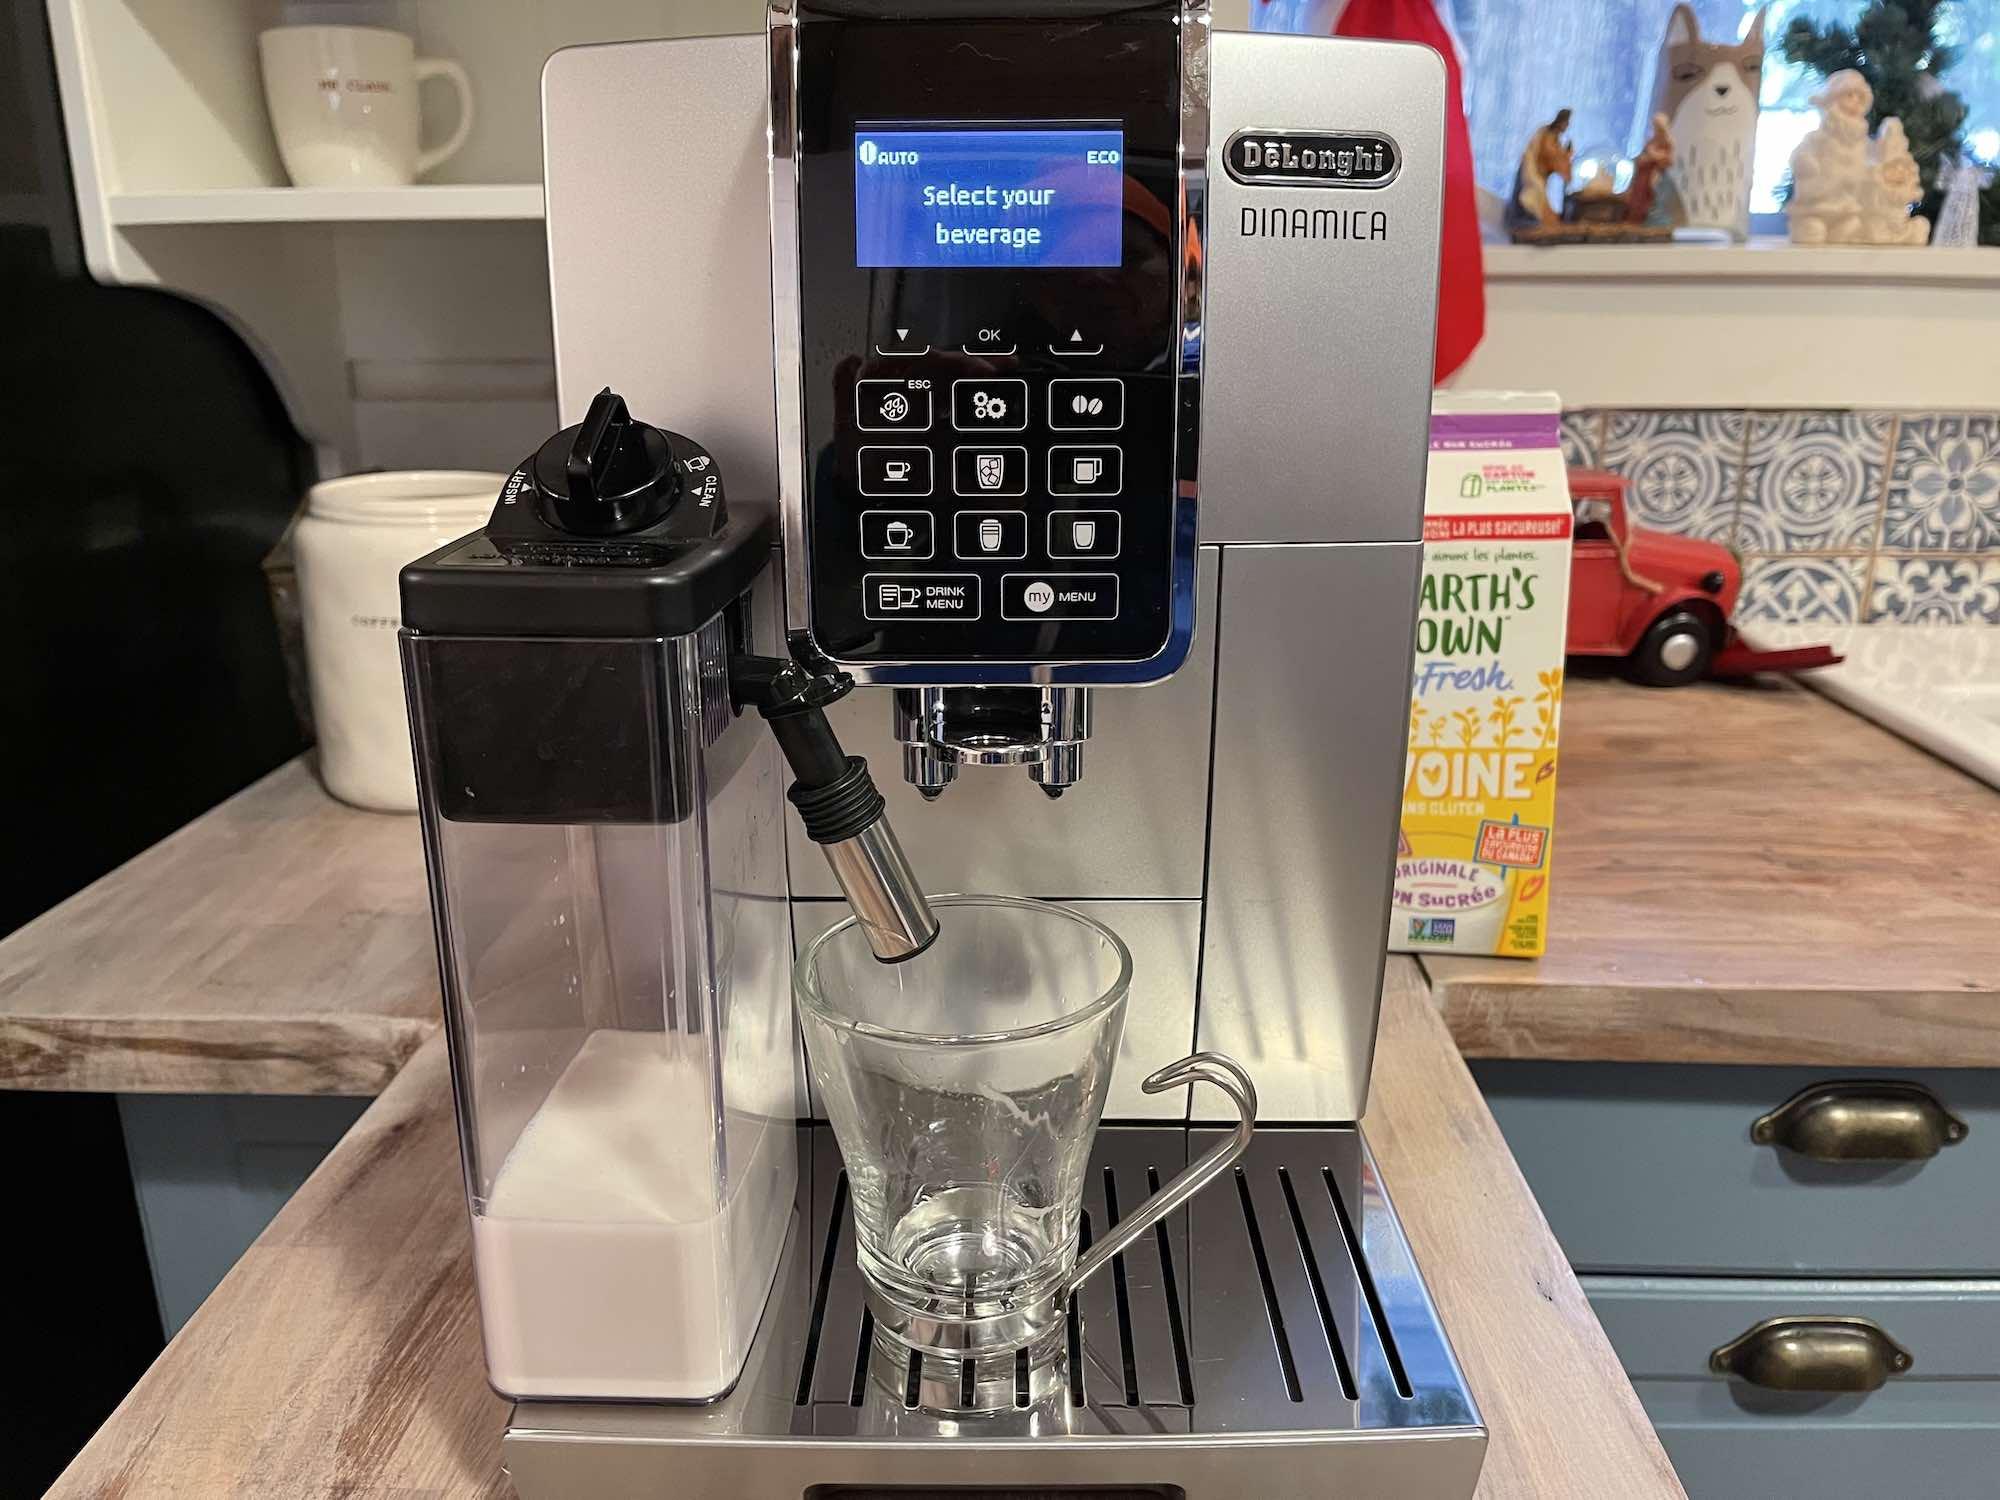 De'Longhi Automatic Espresso Machine Oat Milk